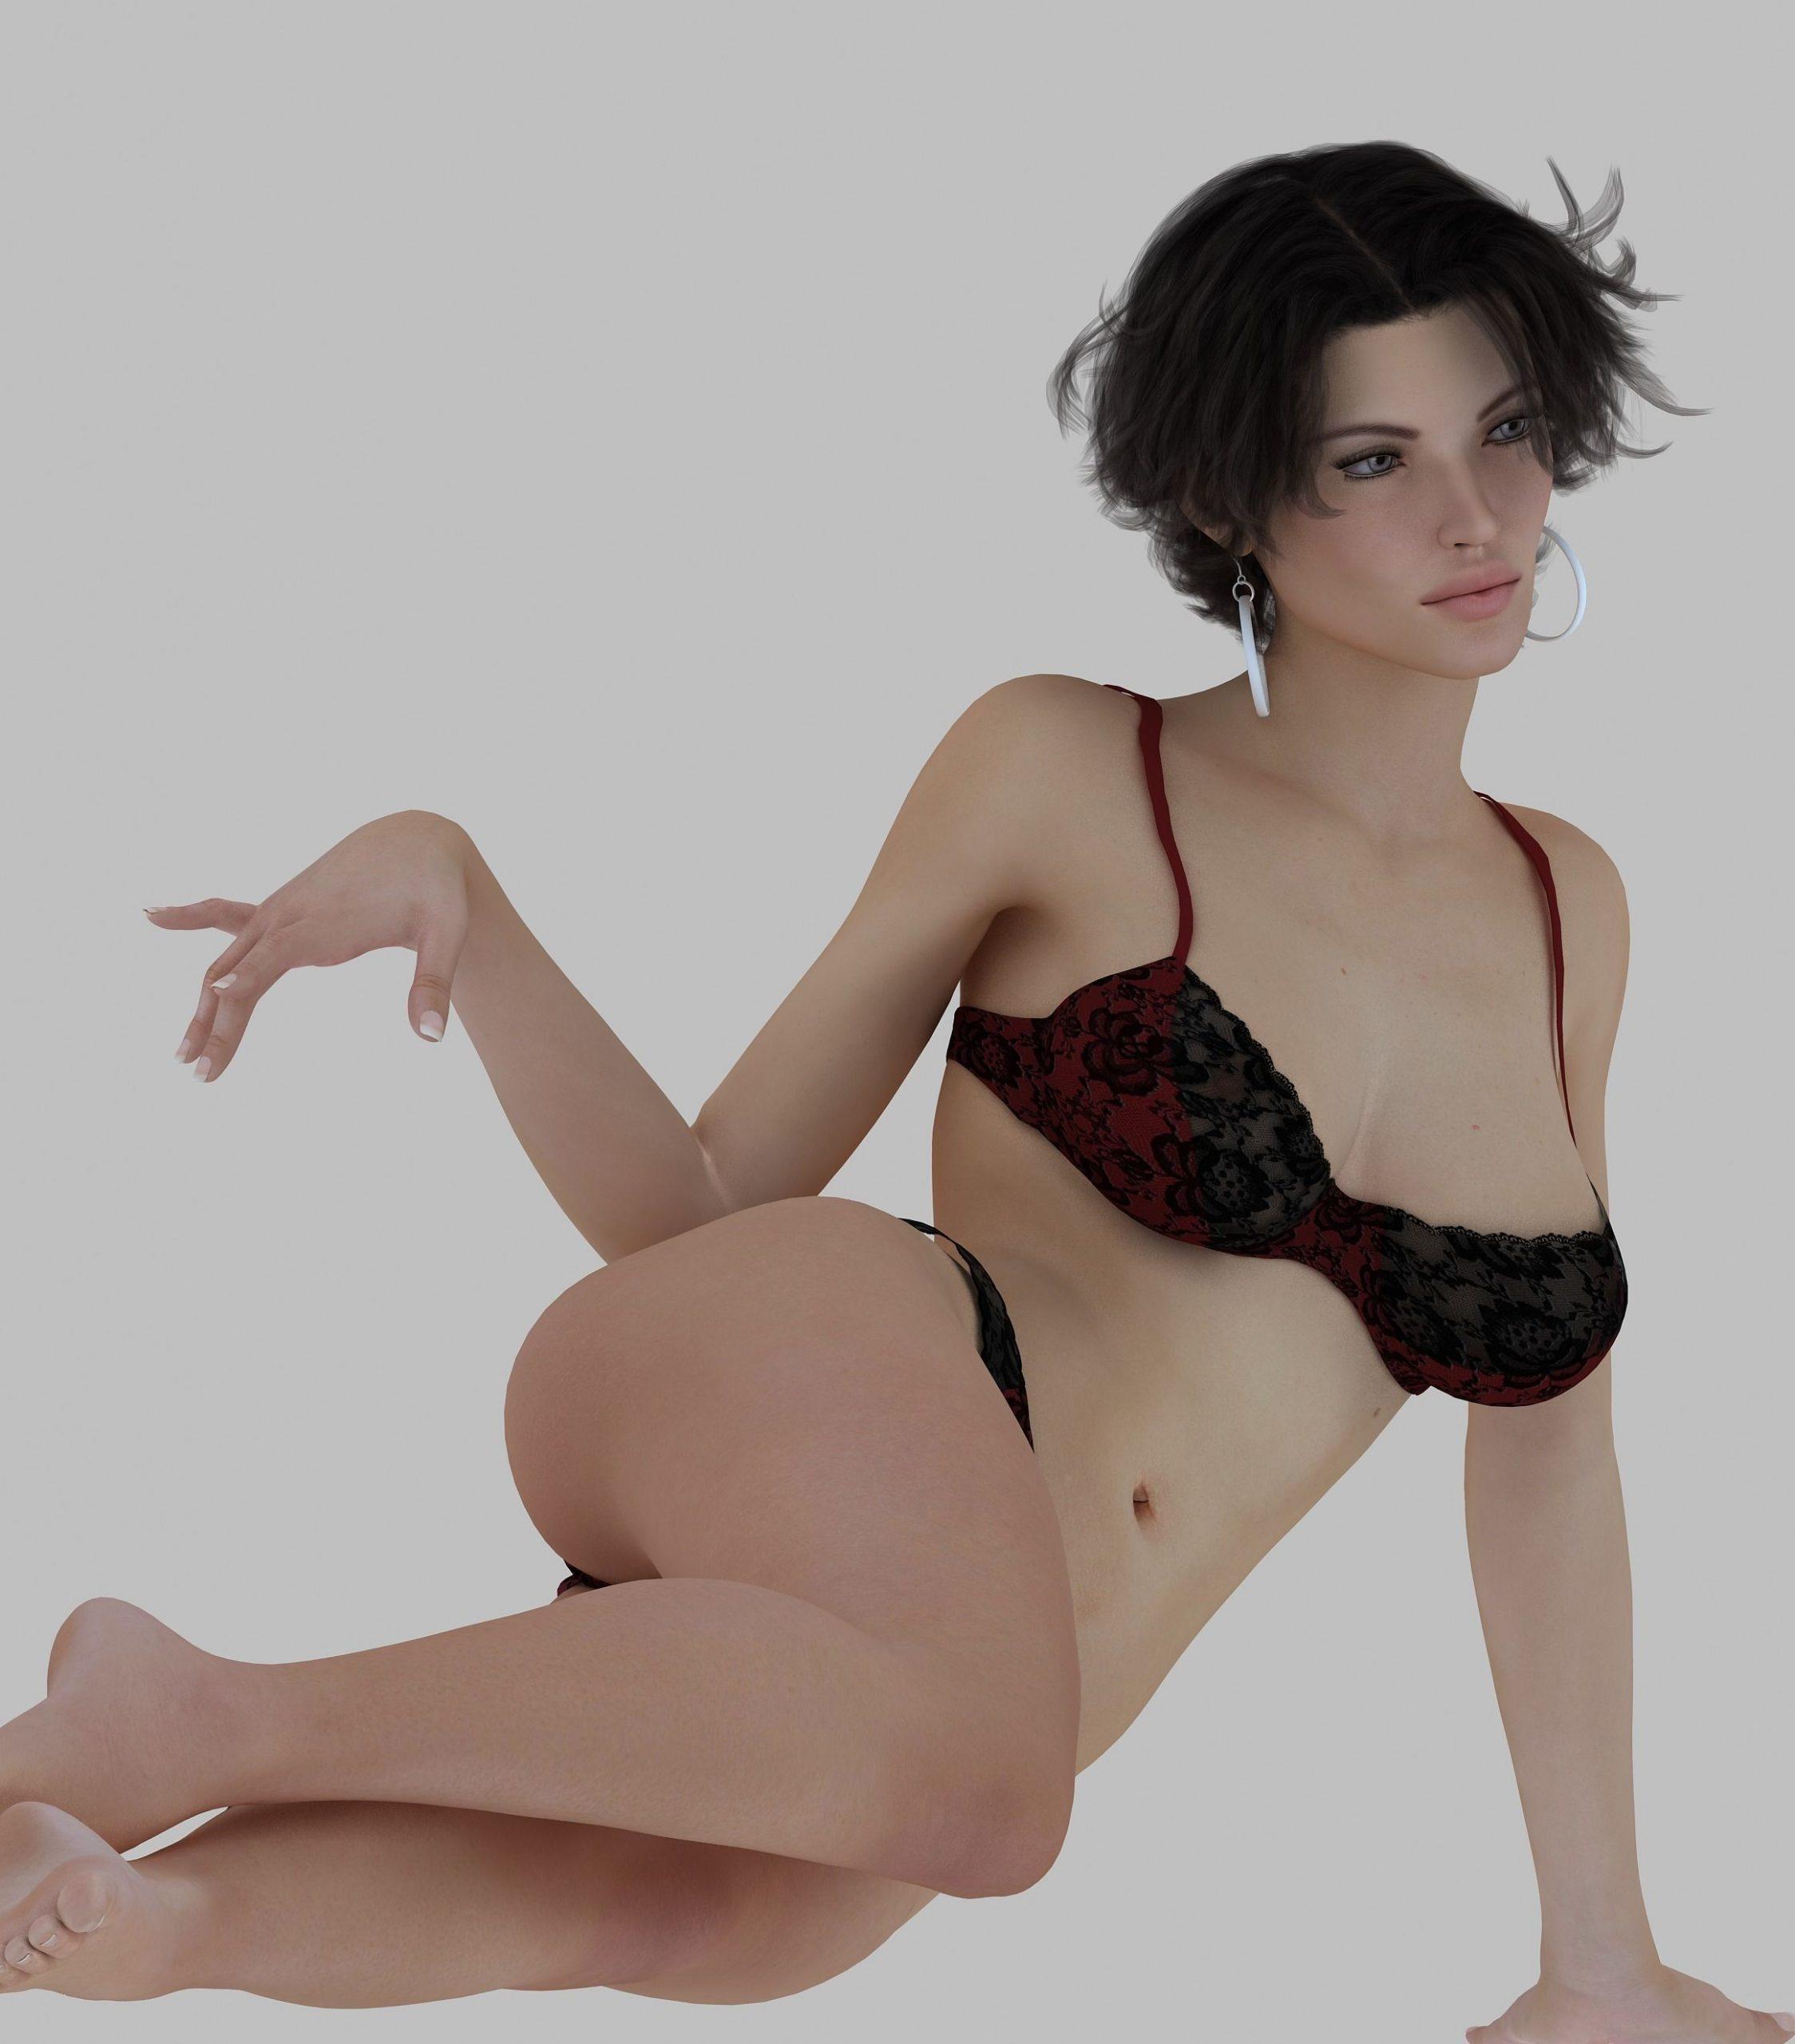 Seductive girl Free 3D model